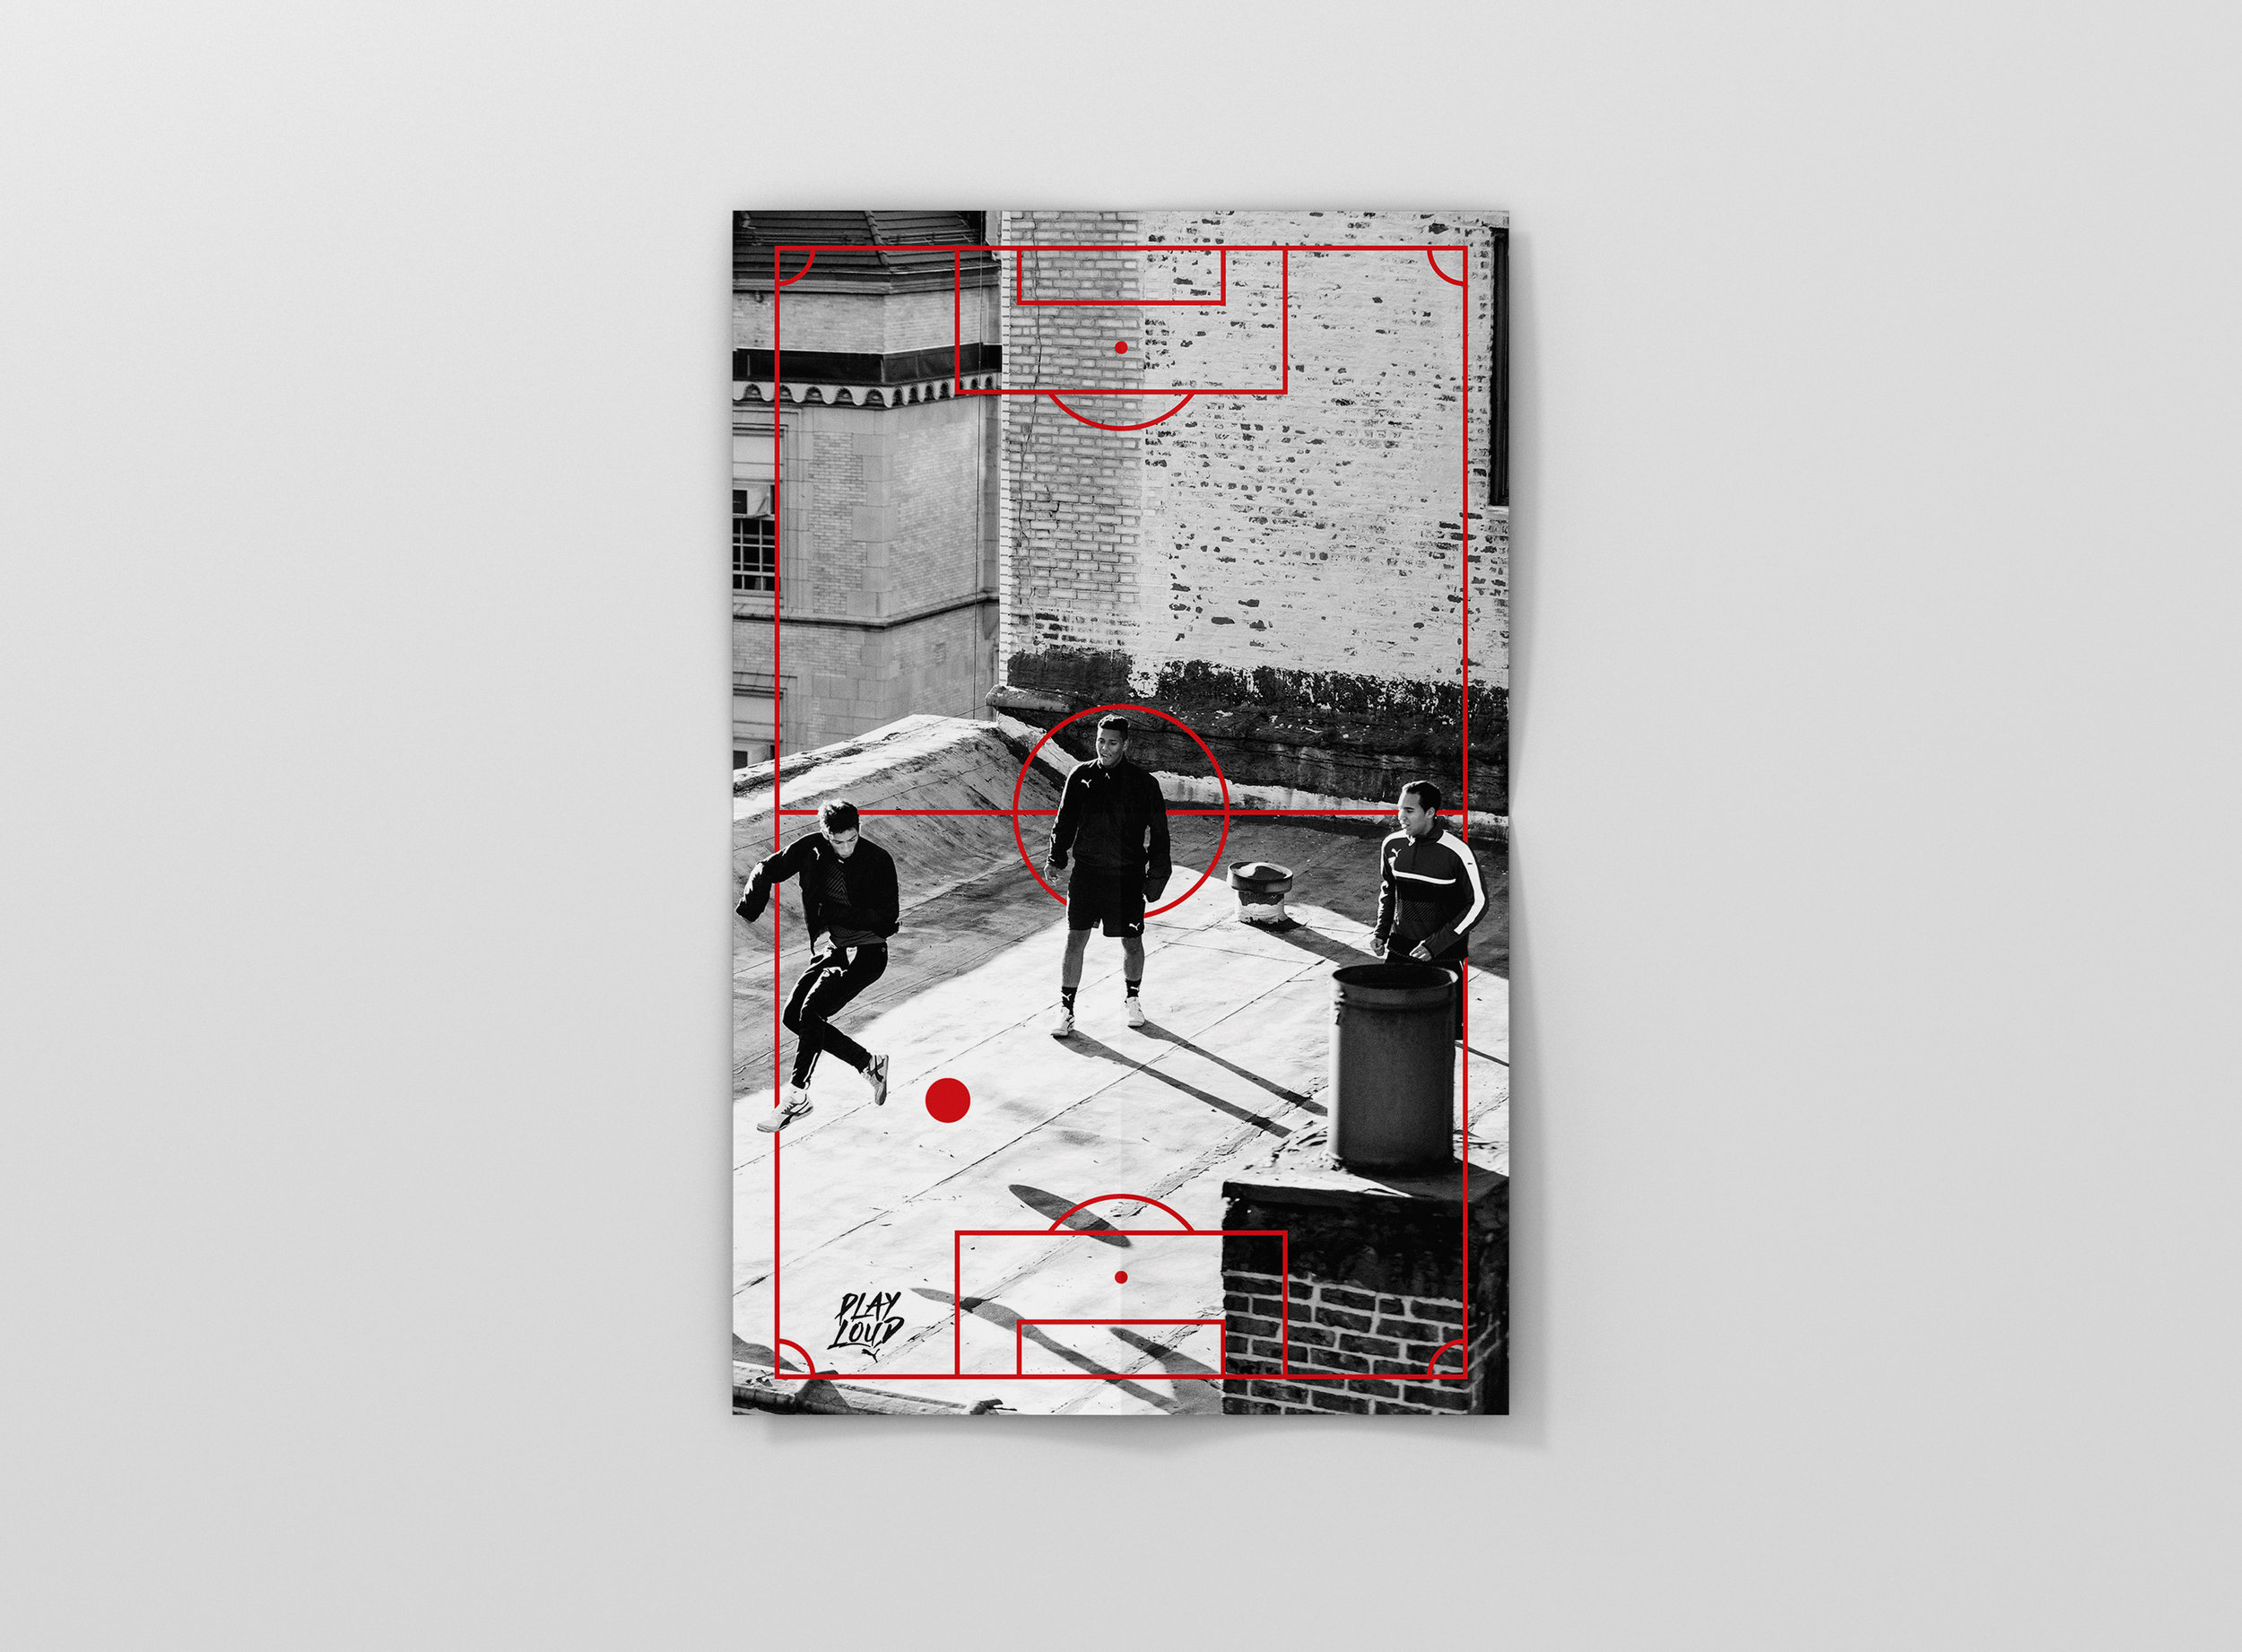 Folded_poster_KidsRoof_Tabloid.jpg